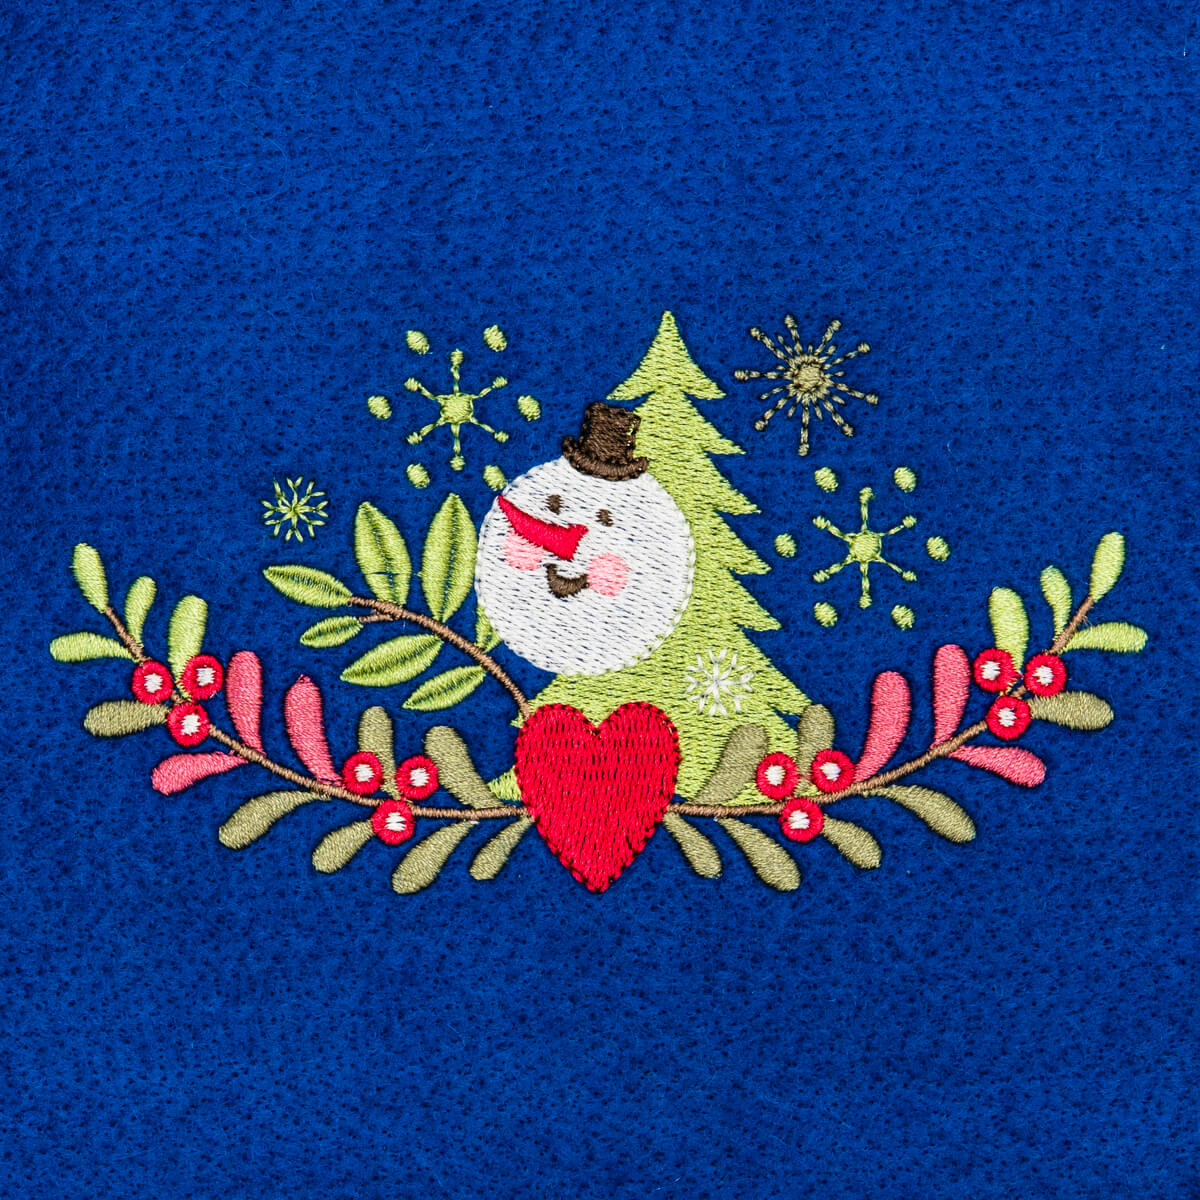 Matriz de bordado floral natalino 8